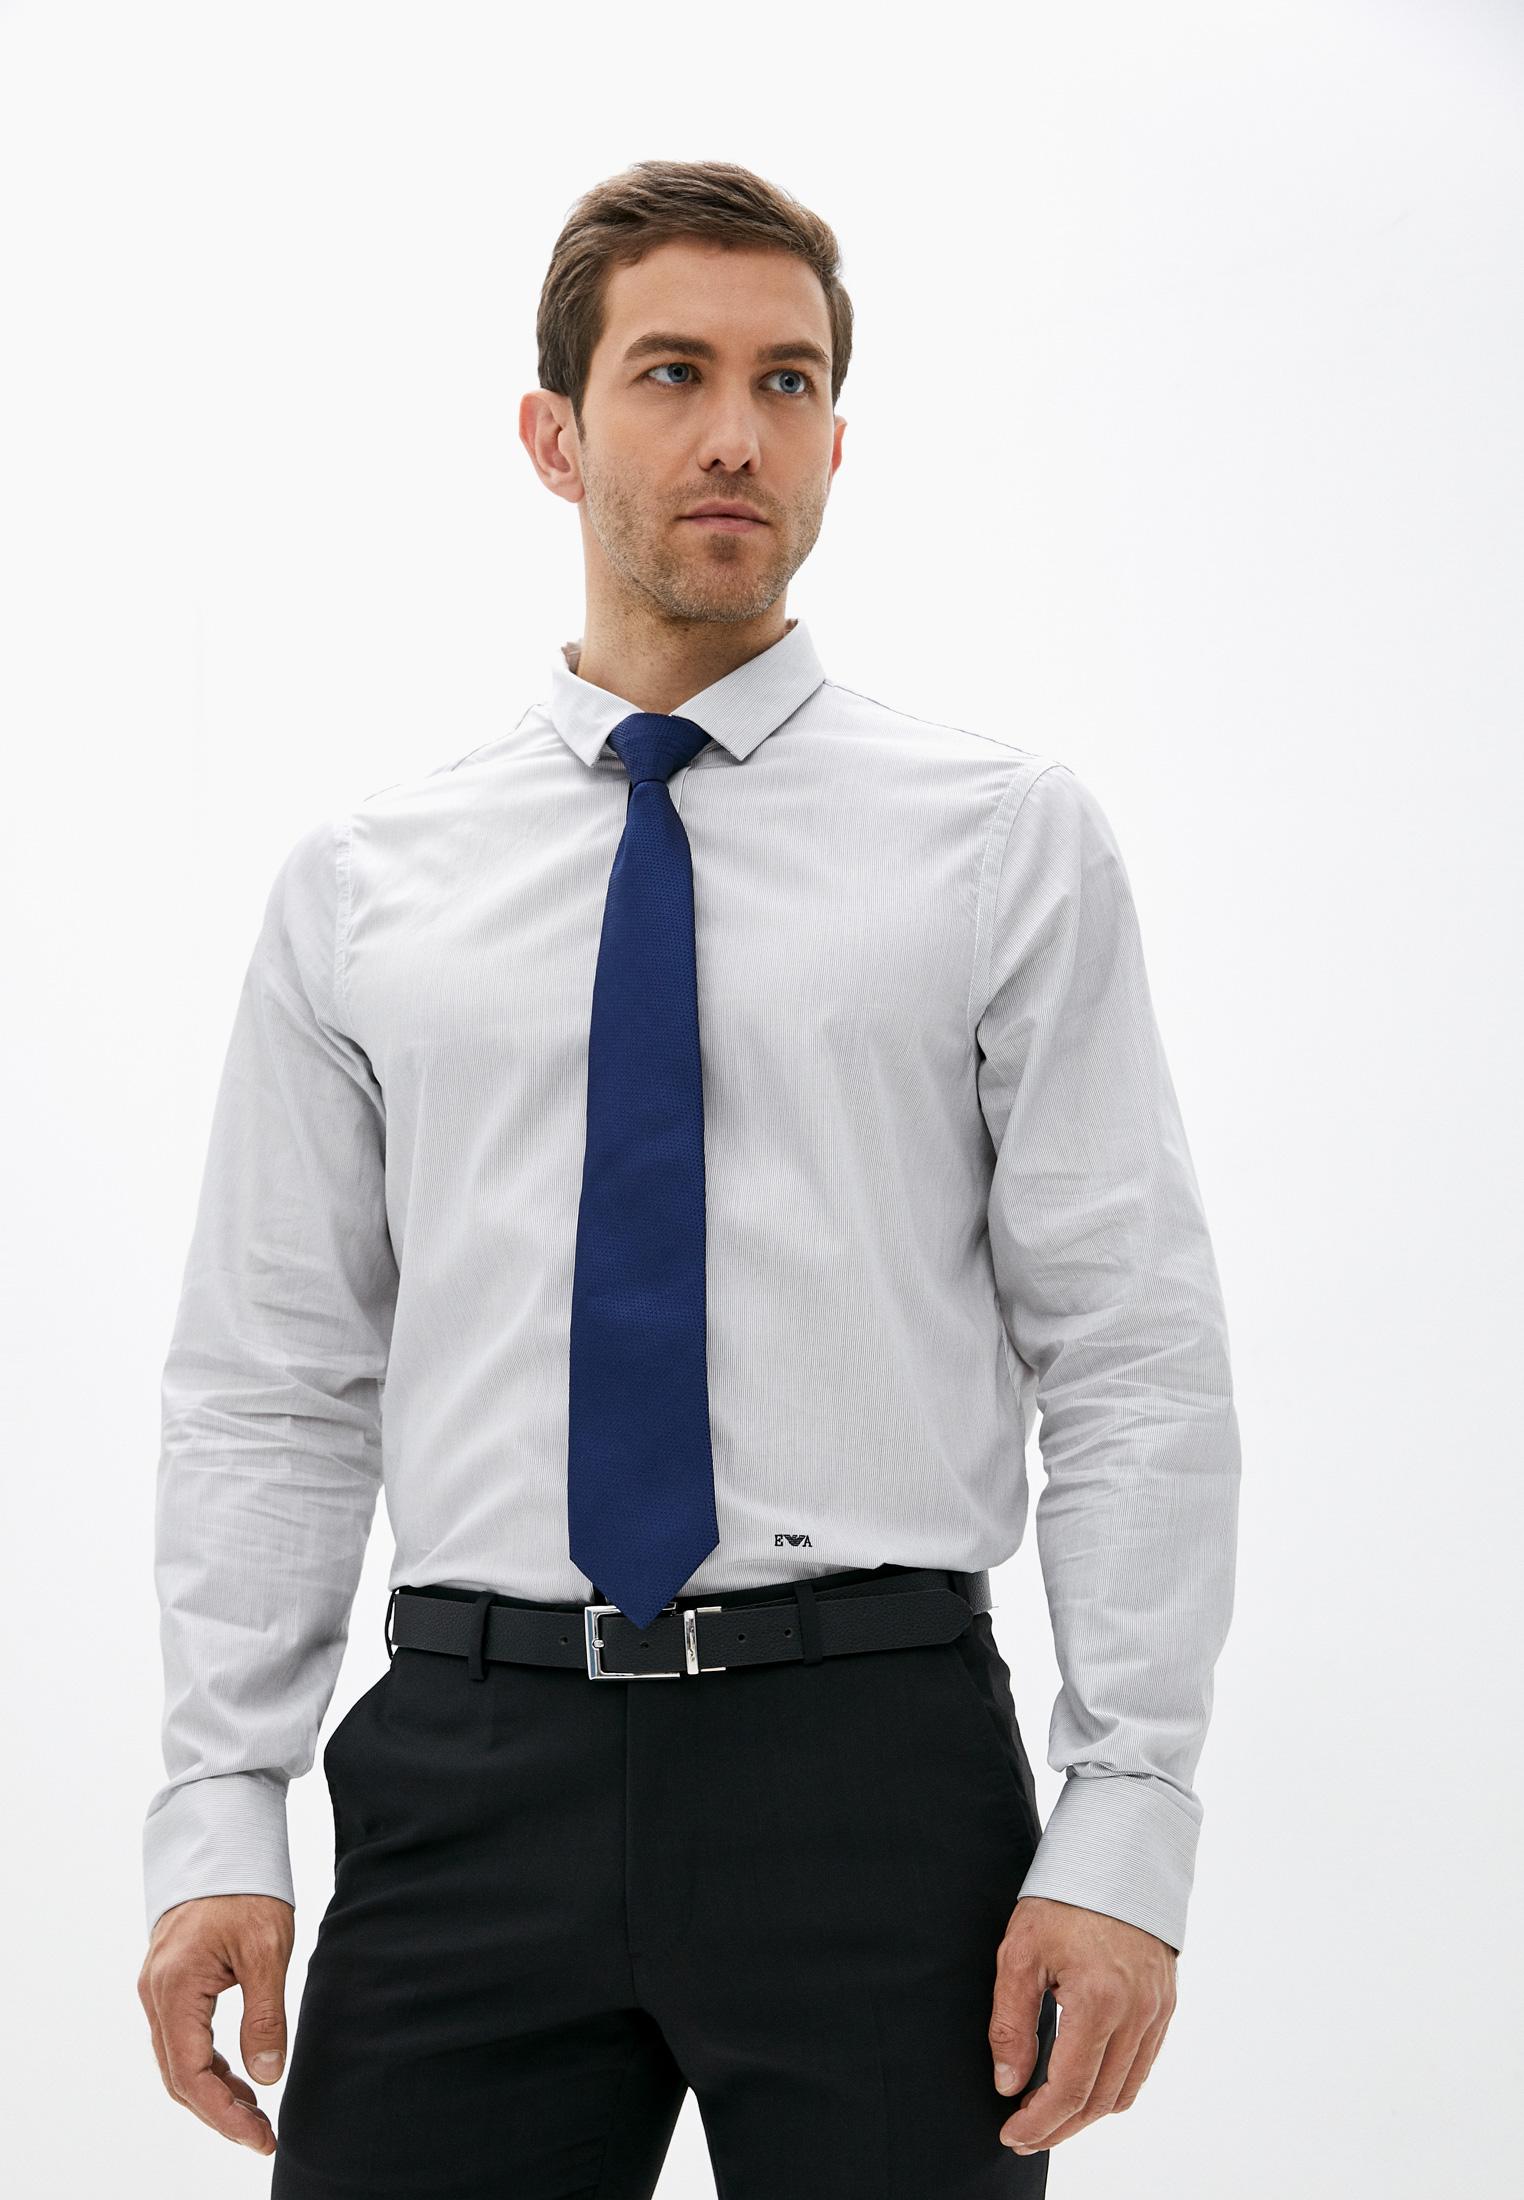 Рубашка с длинным рукавом Emporio Armani (Эмпорио Армани) 3Z1CL2 1NCMZ